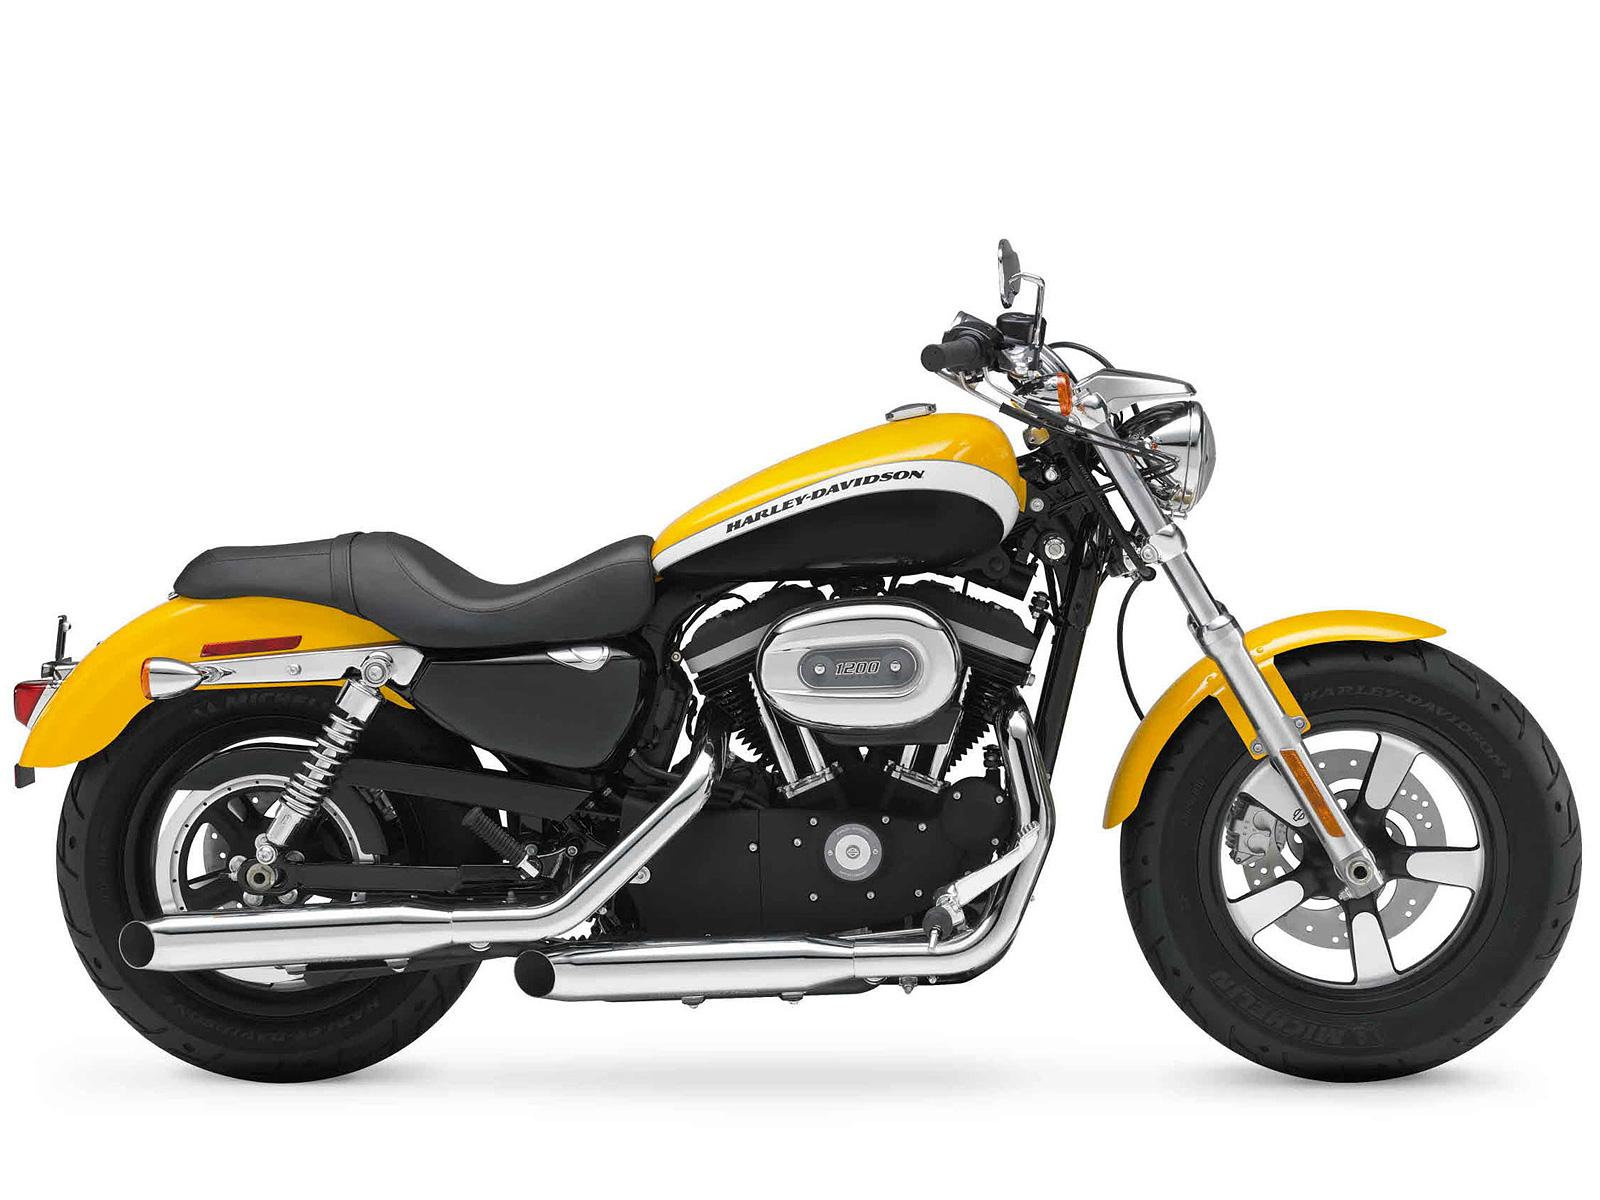 Harley Softail Wiring Diagram Vw Sharan Radio Davidson Xl 1200 X Sportster Forty Eight